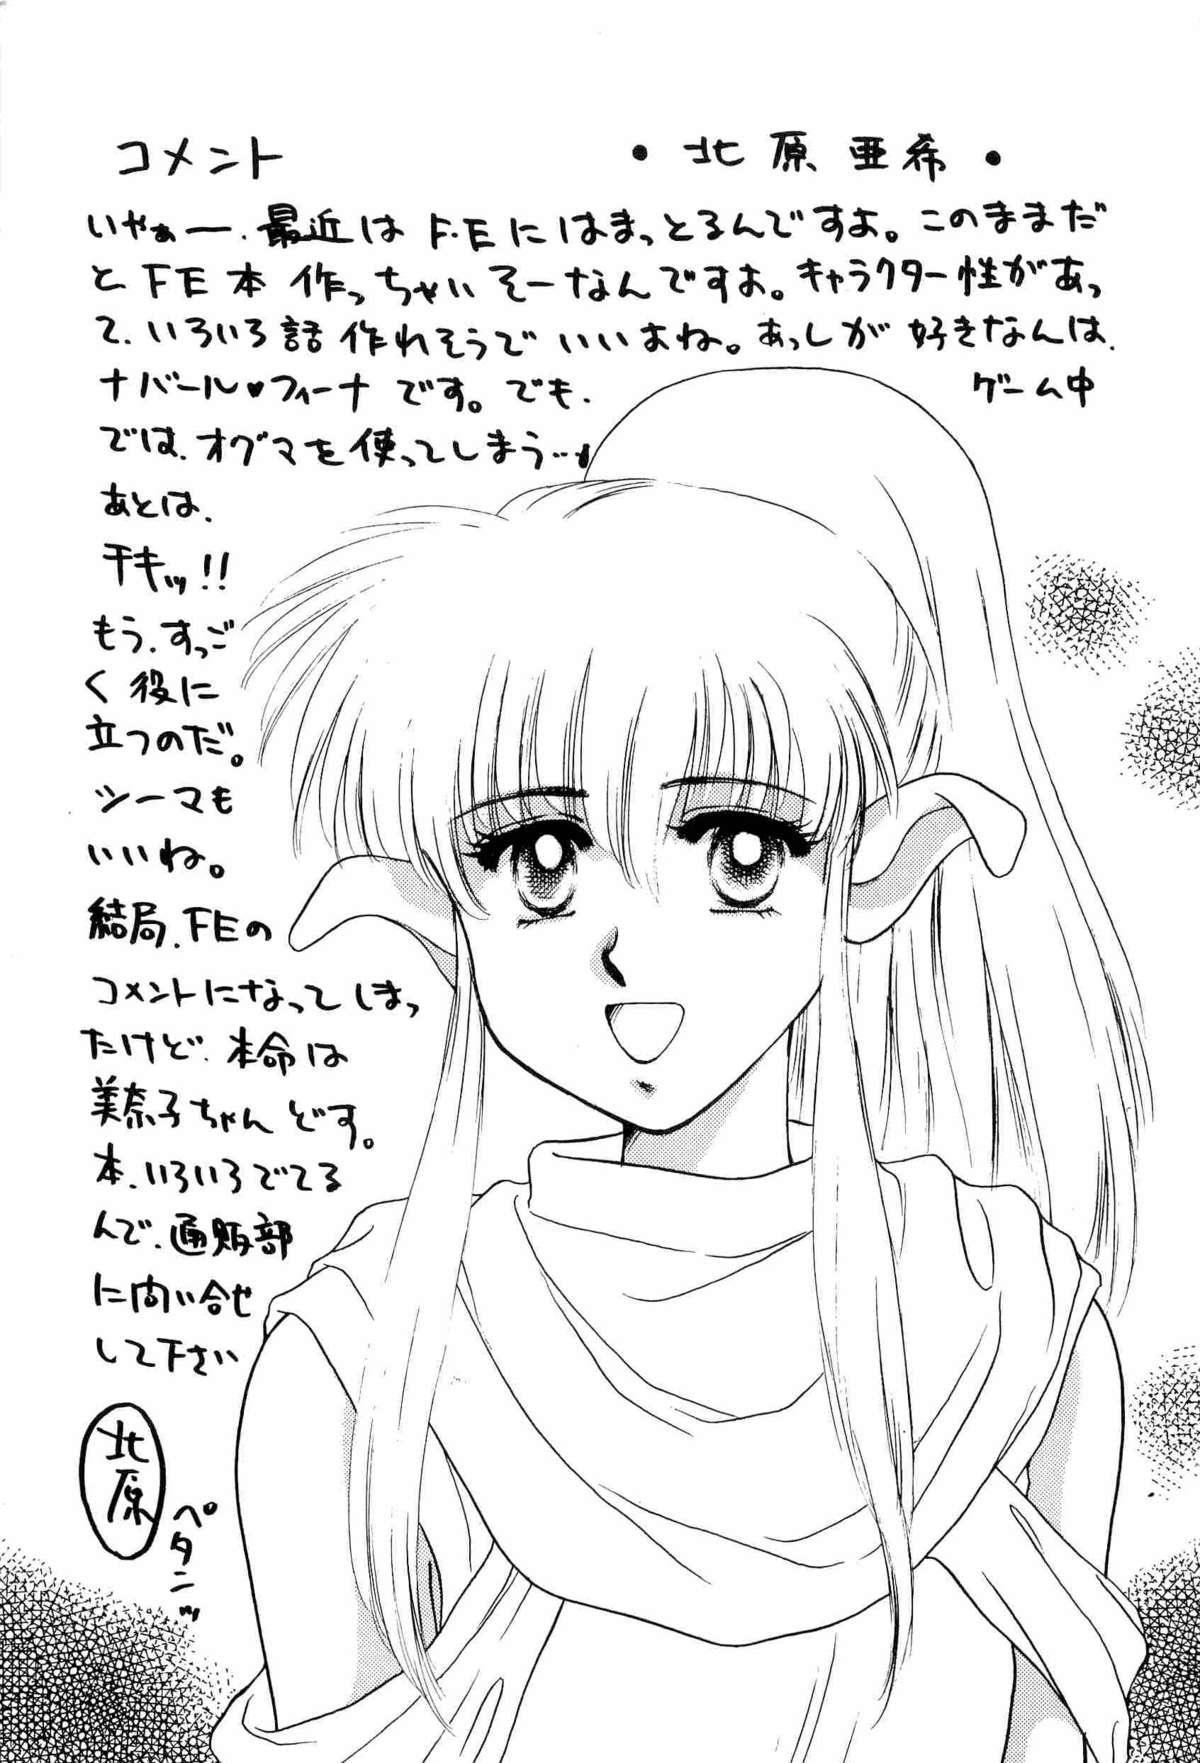 Bisyoujo Anthology '93 jyoukan 23